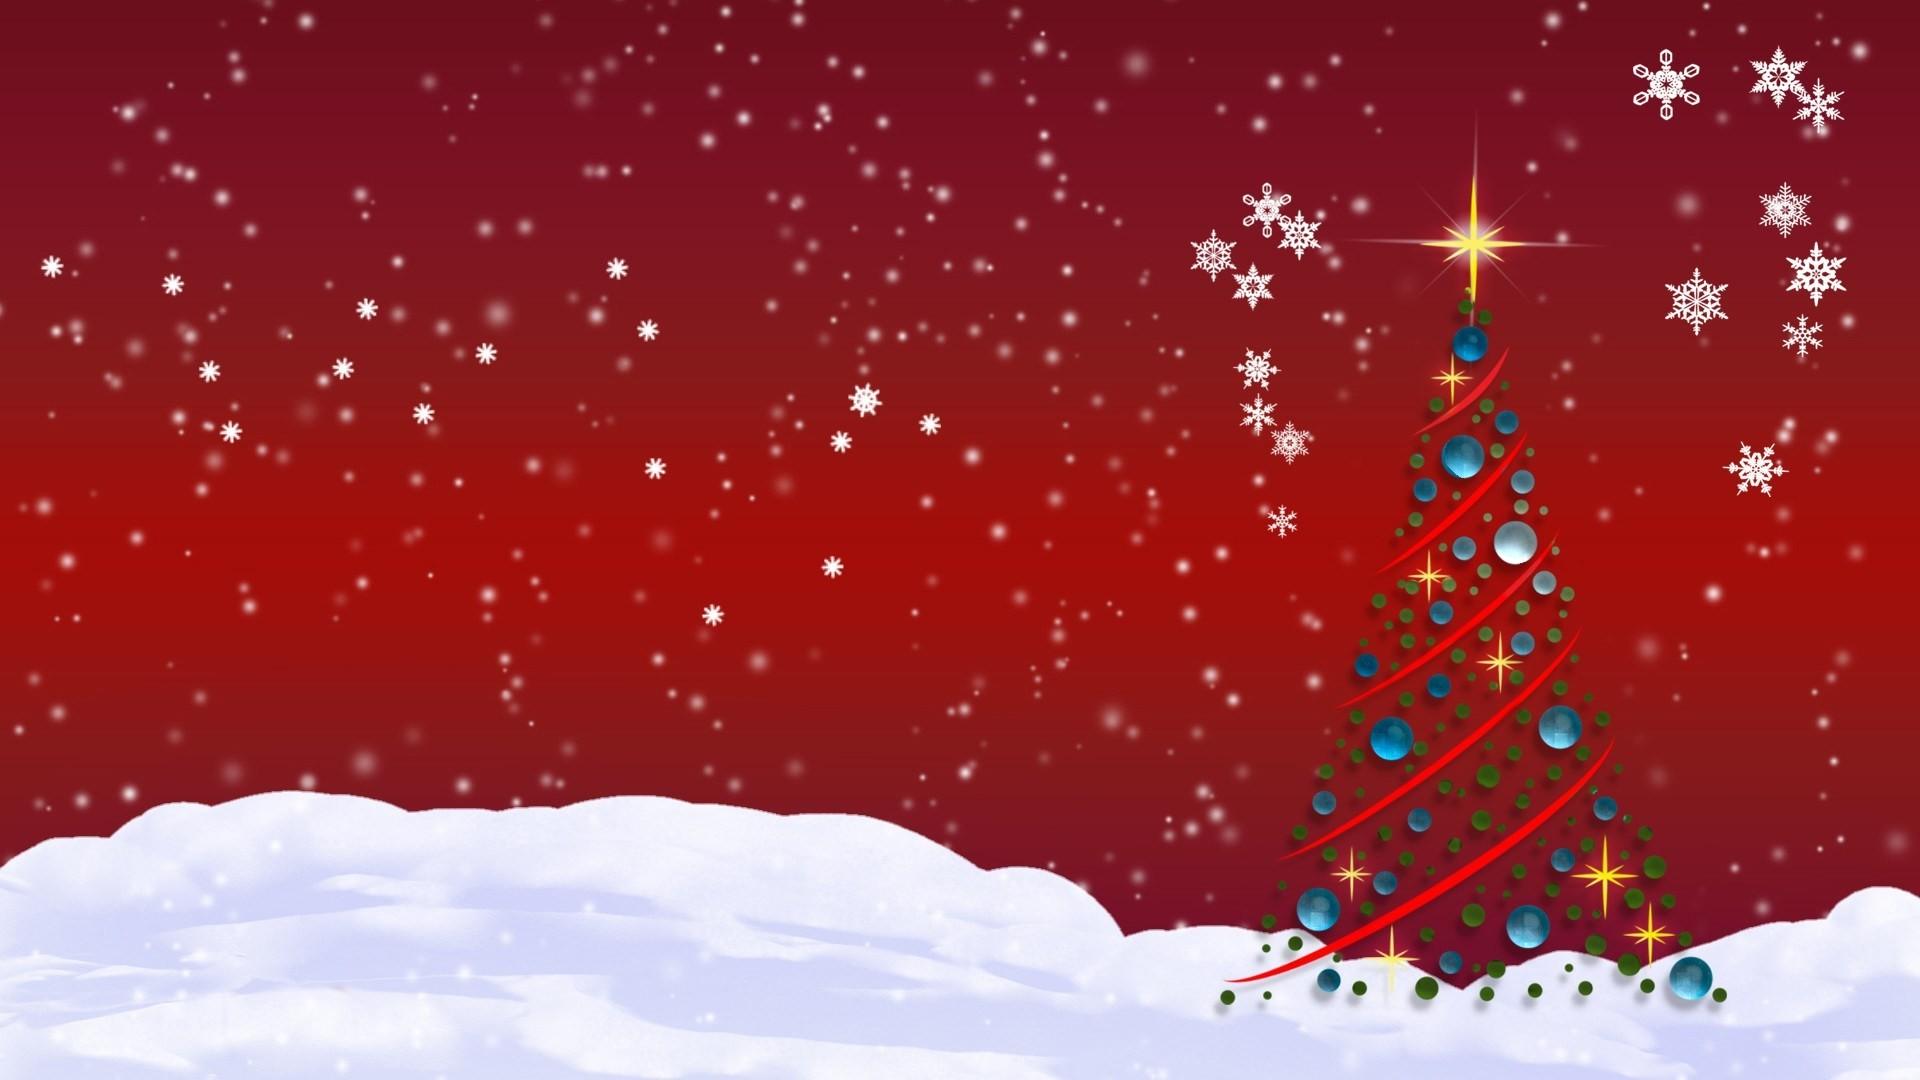 … Cool Christmas Screen Savers Wallpaper Free Download Wallpapers –  Download Free Cool Wallpapers for PC Download